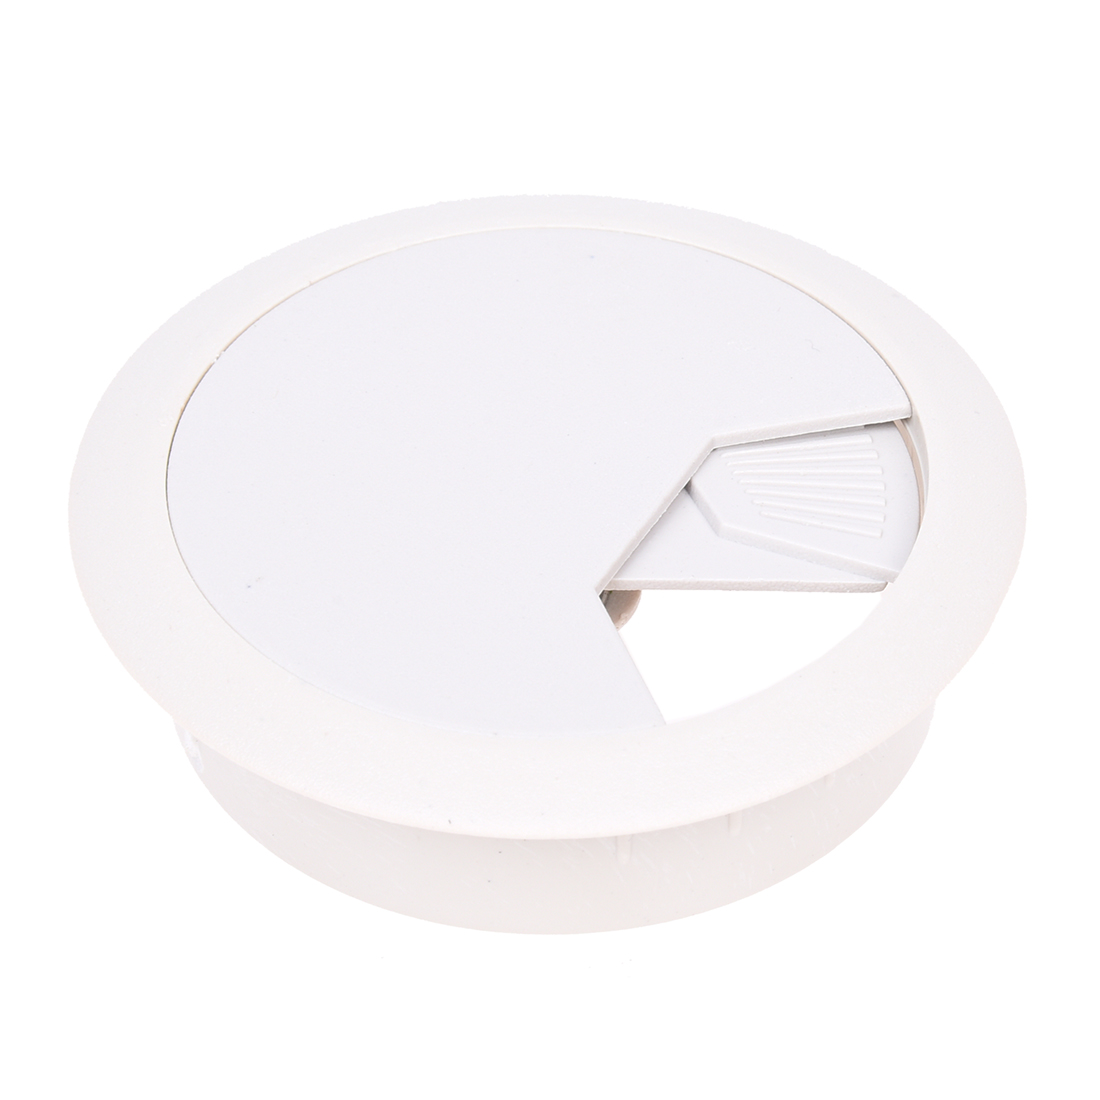 PC Desk Gray Plastic 50mm Diameter Grommet Cable Hole Cover 10 Pcs legare straight desk gray driftwood